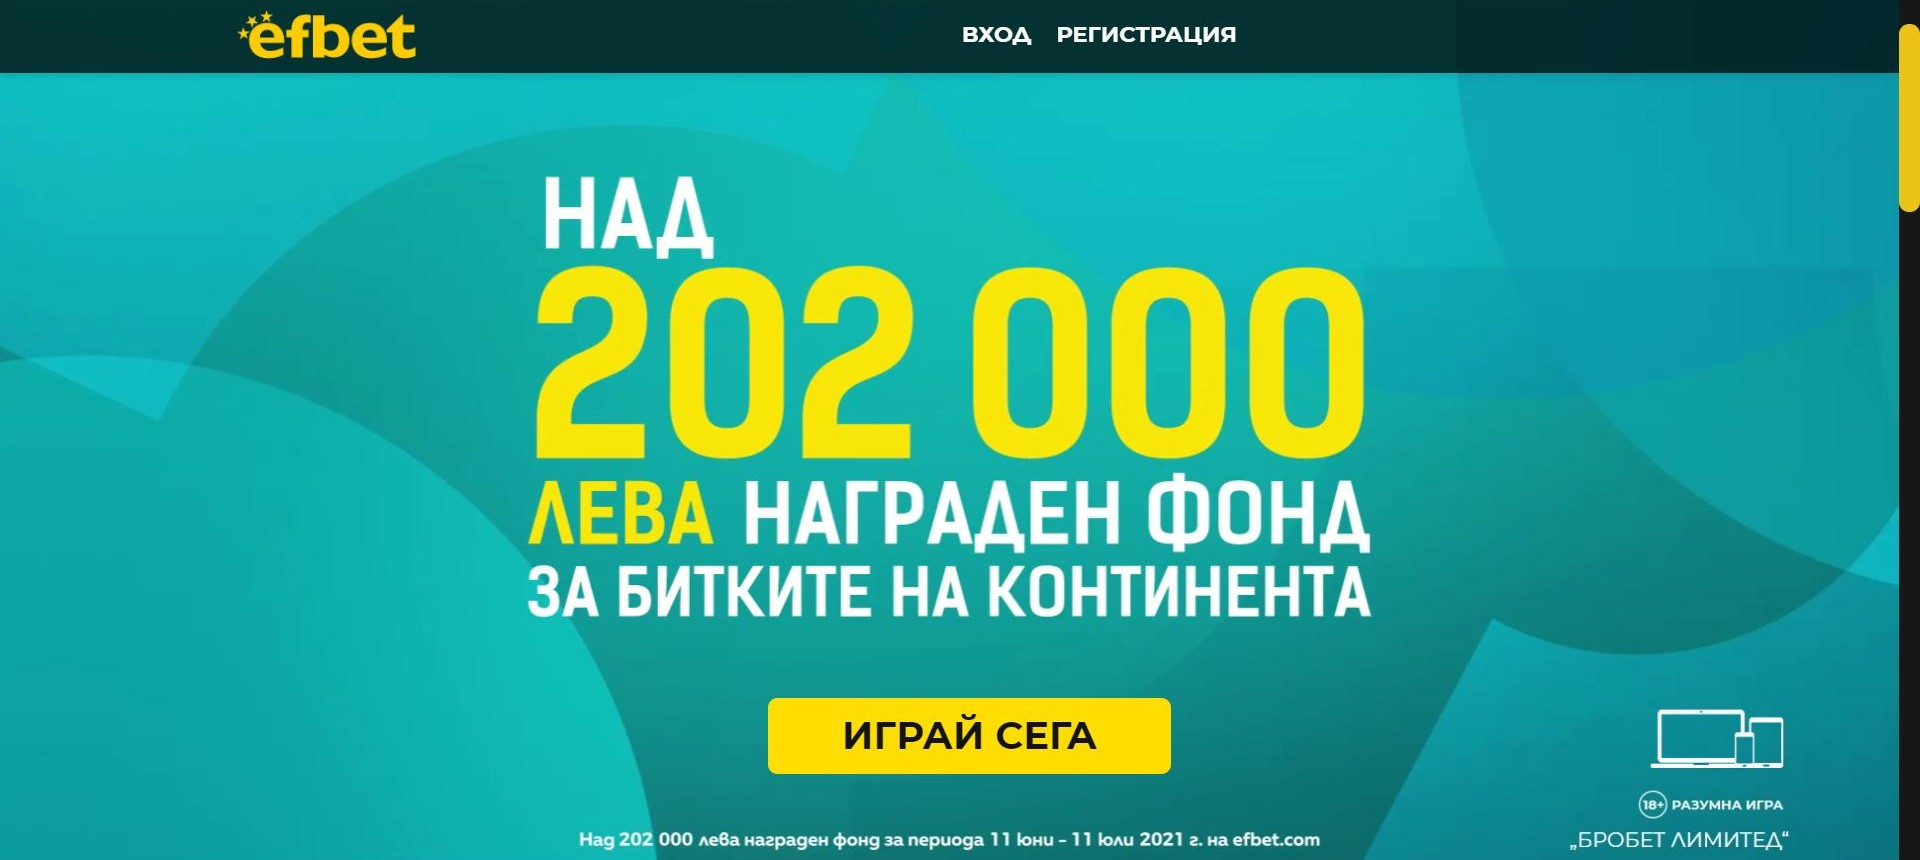 efbet igra evro2020-komarbet.com